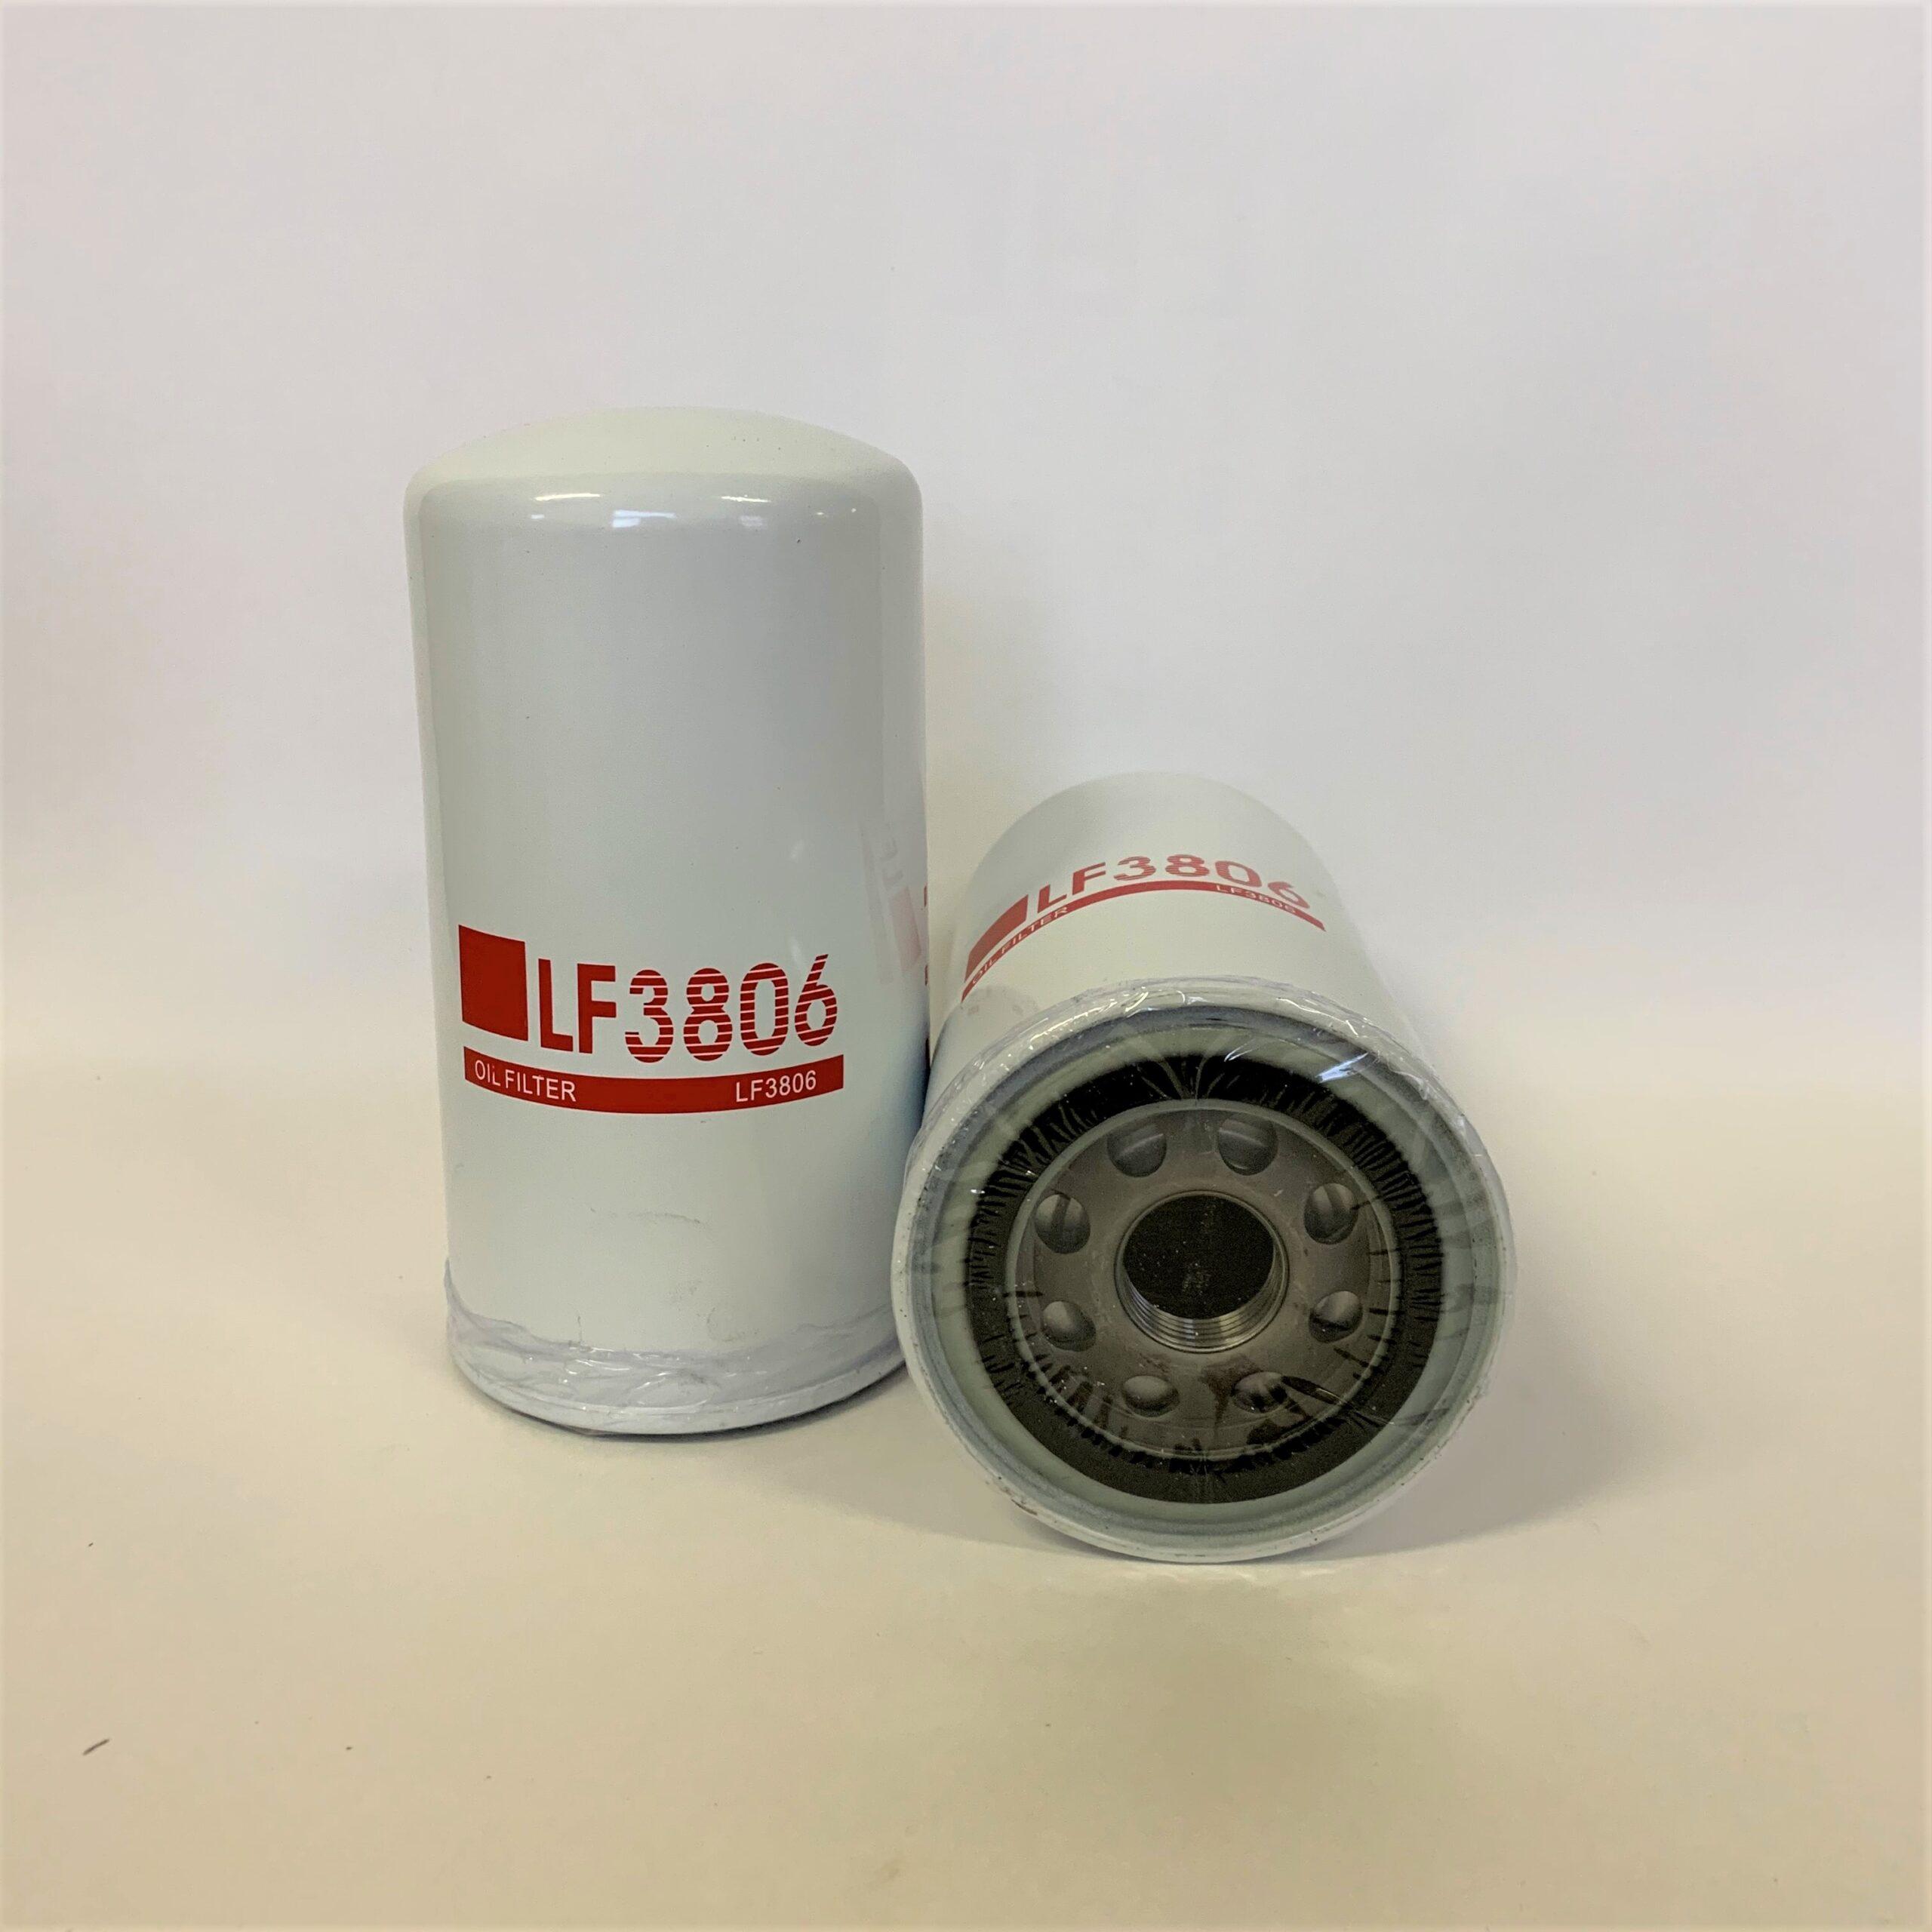 LF3806